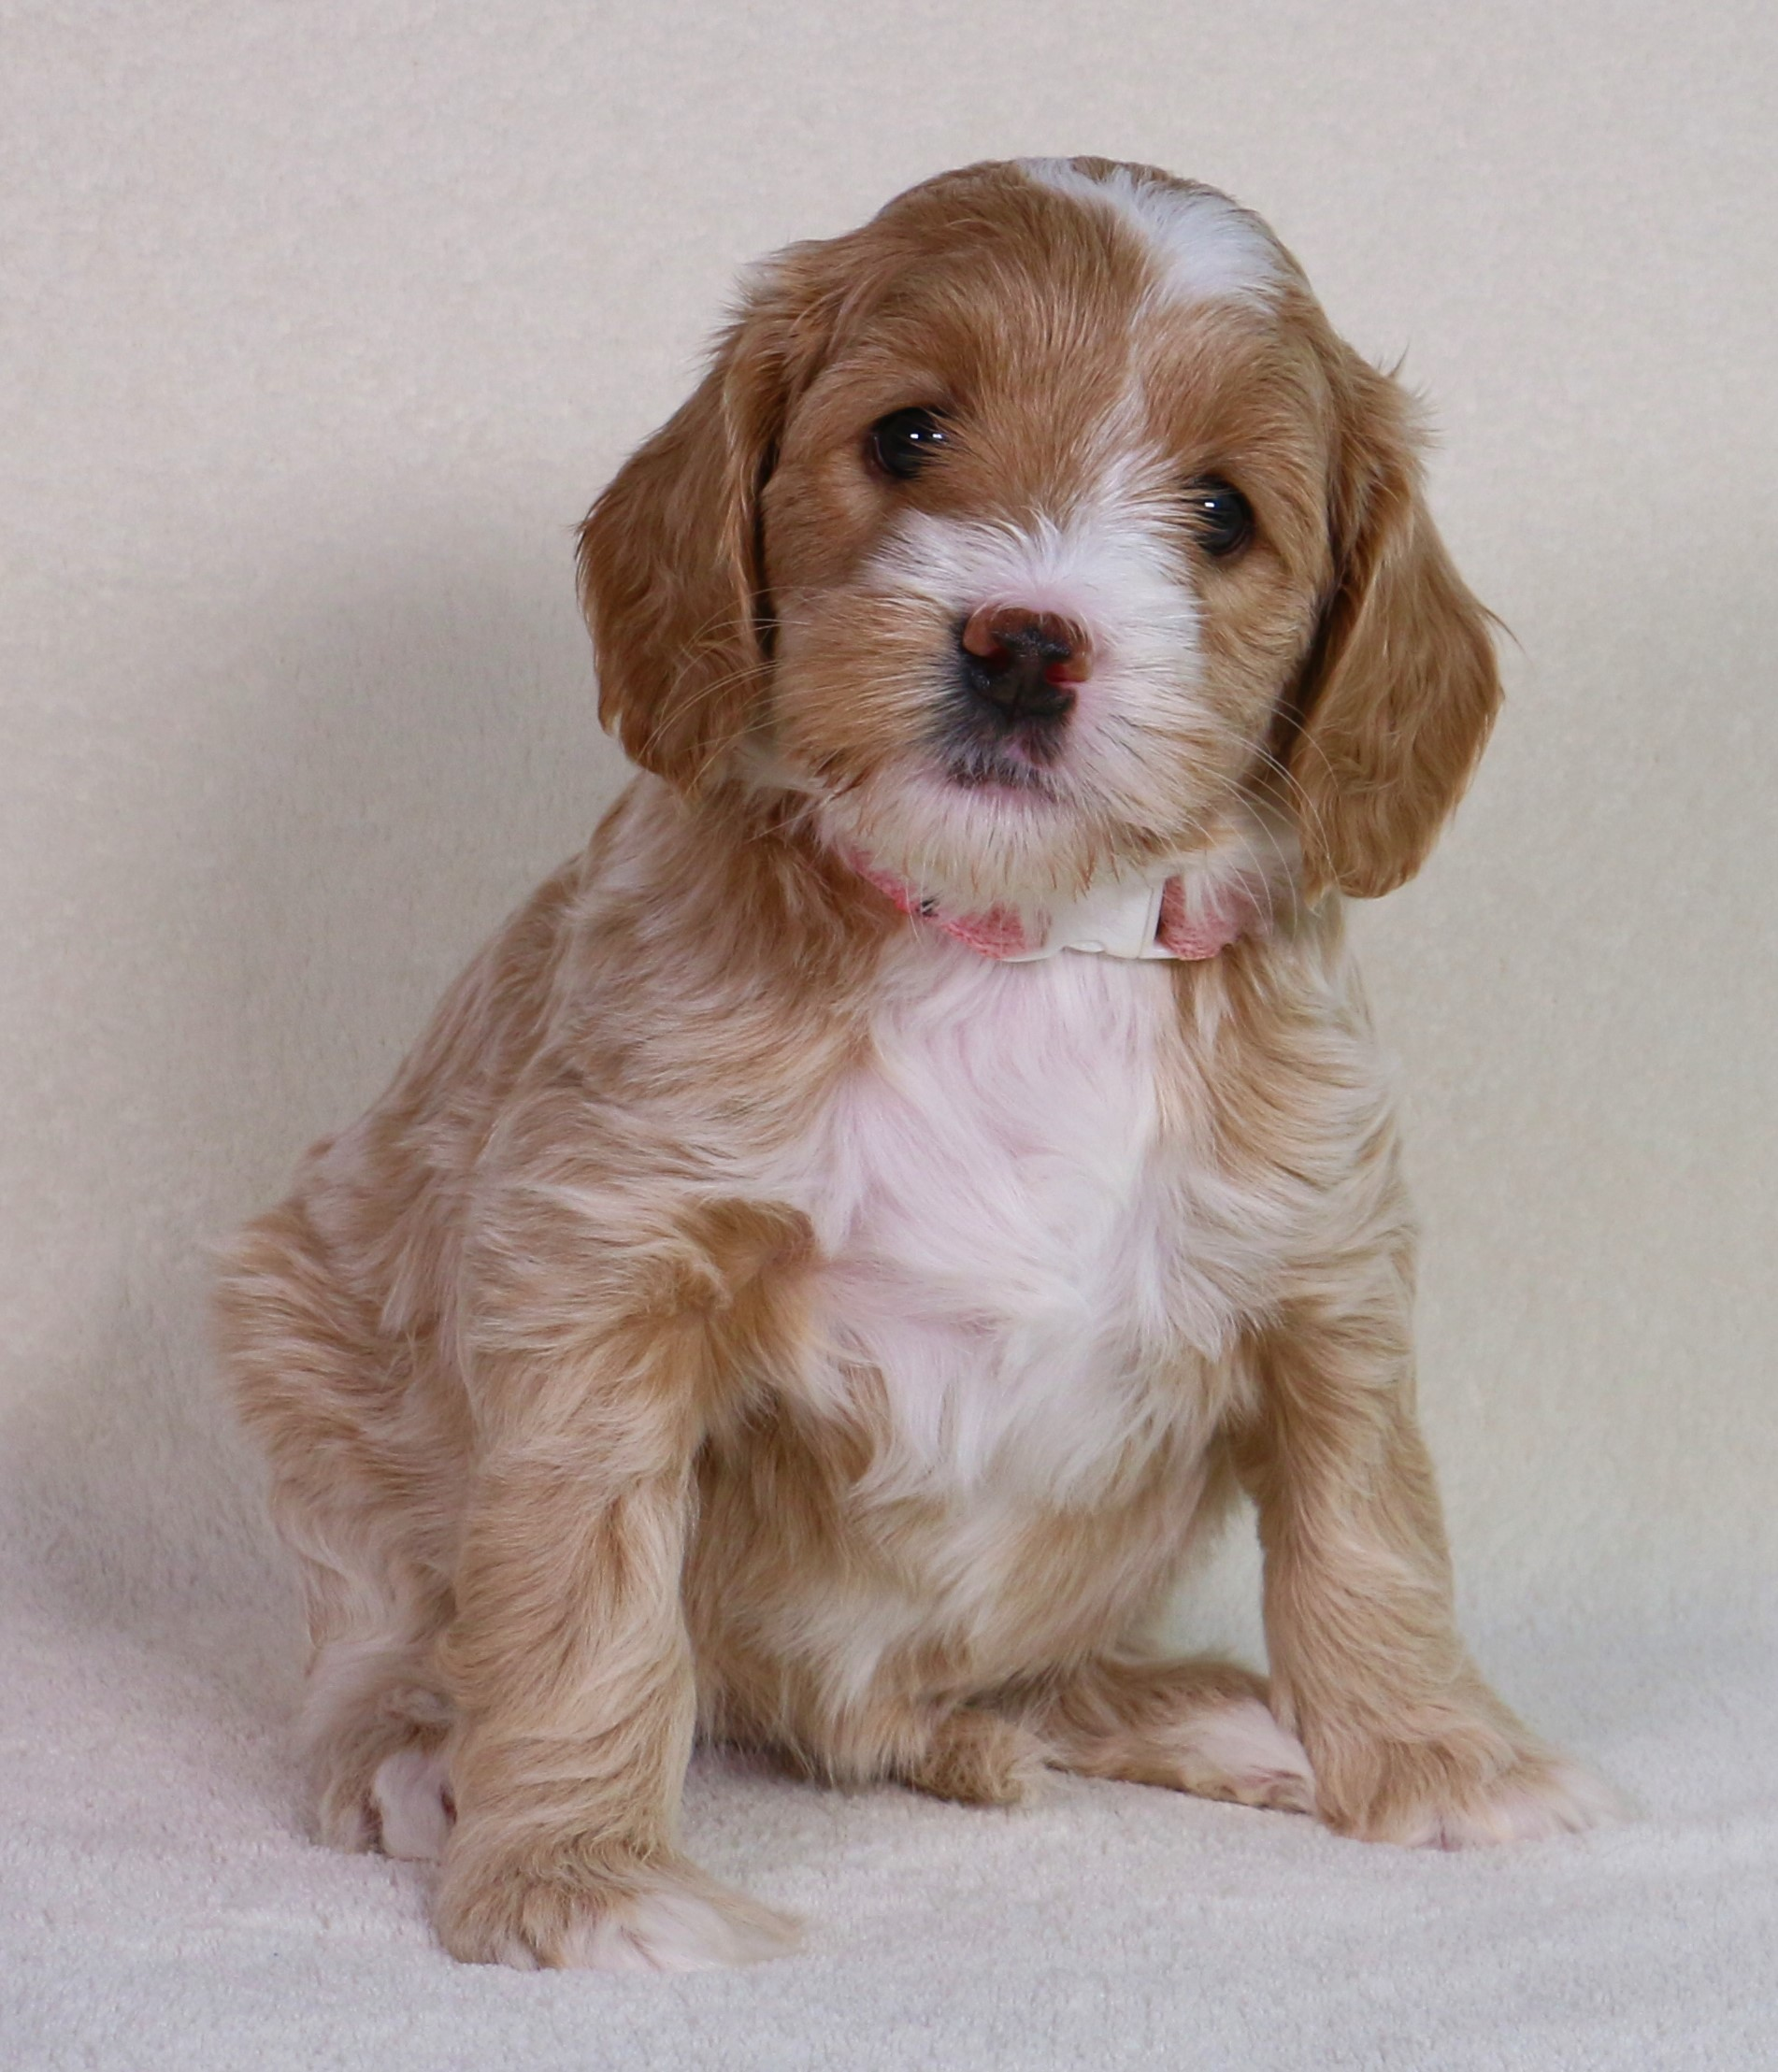 Mabel at 6 Weeks